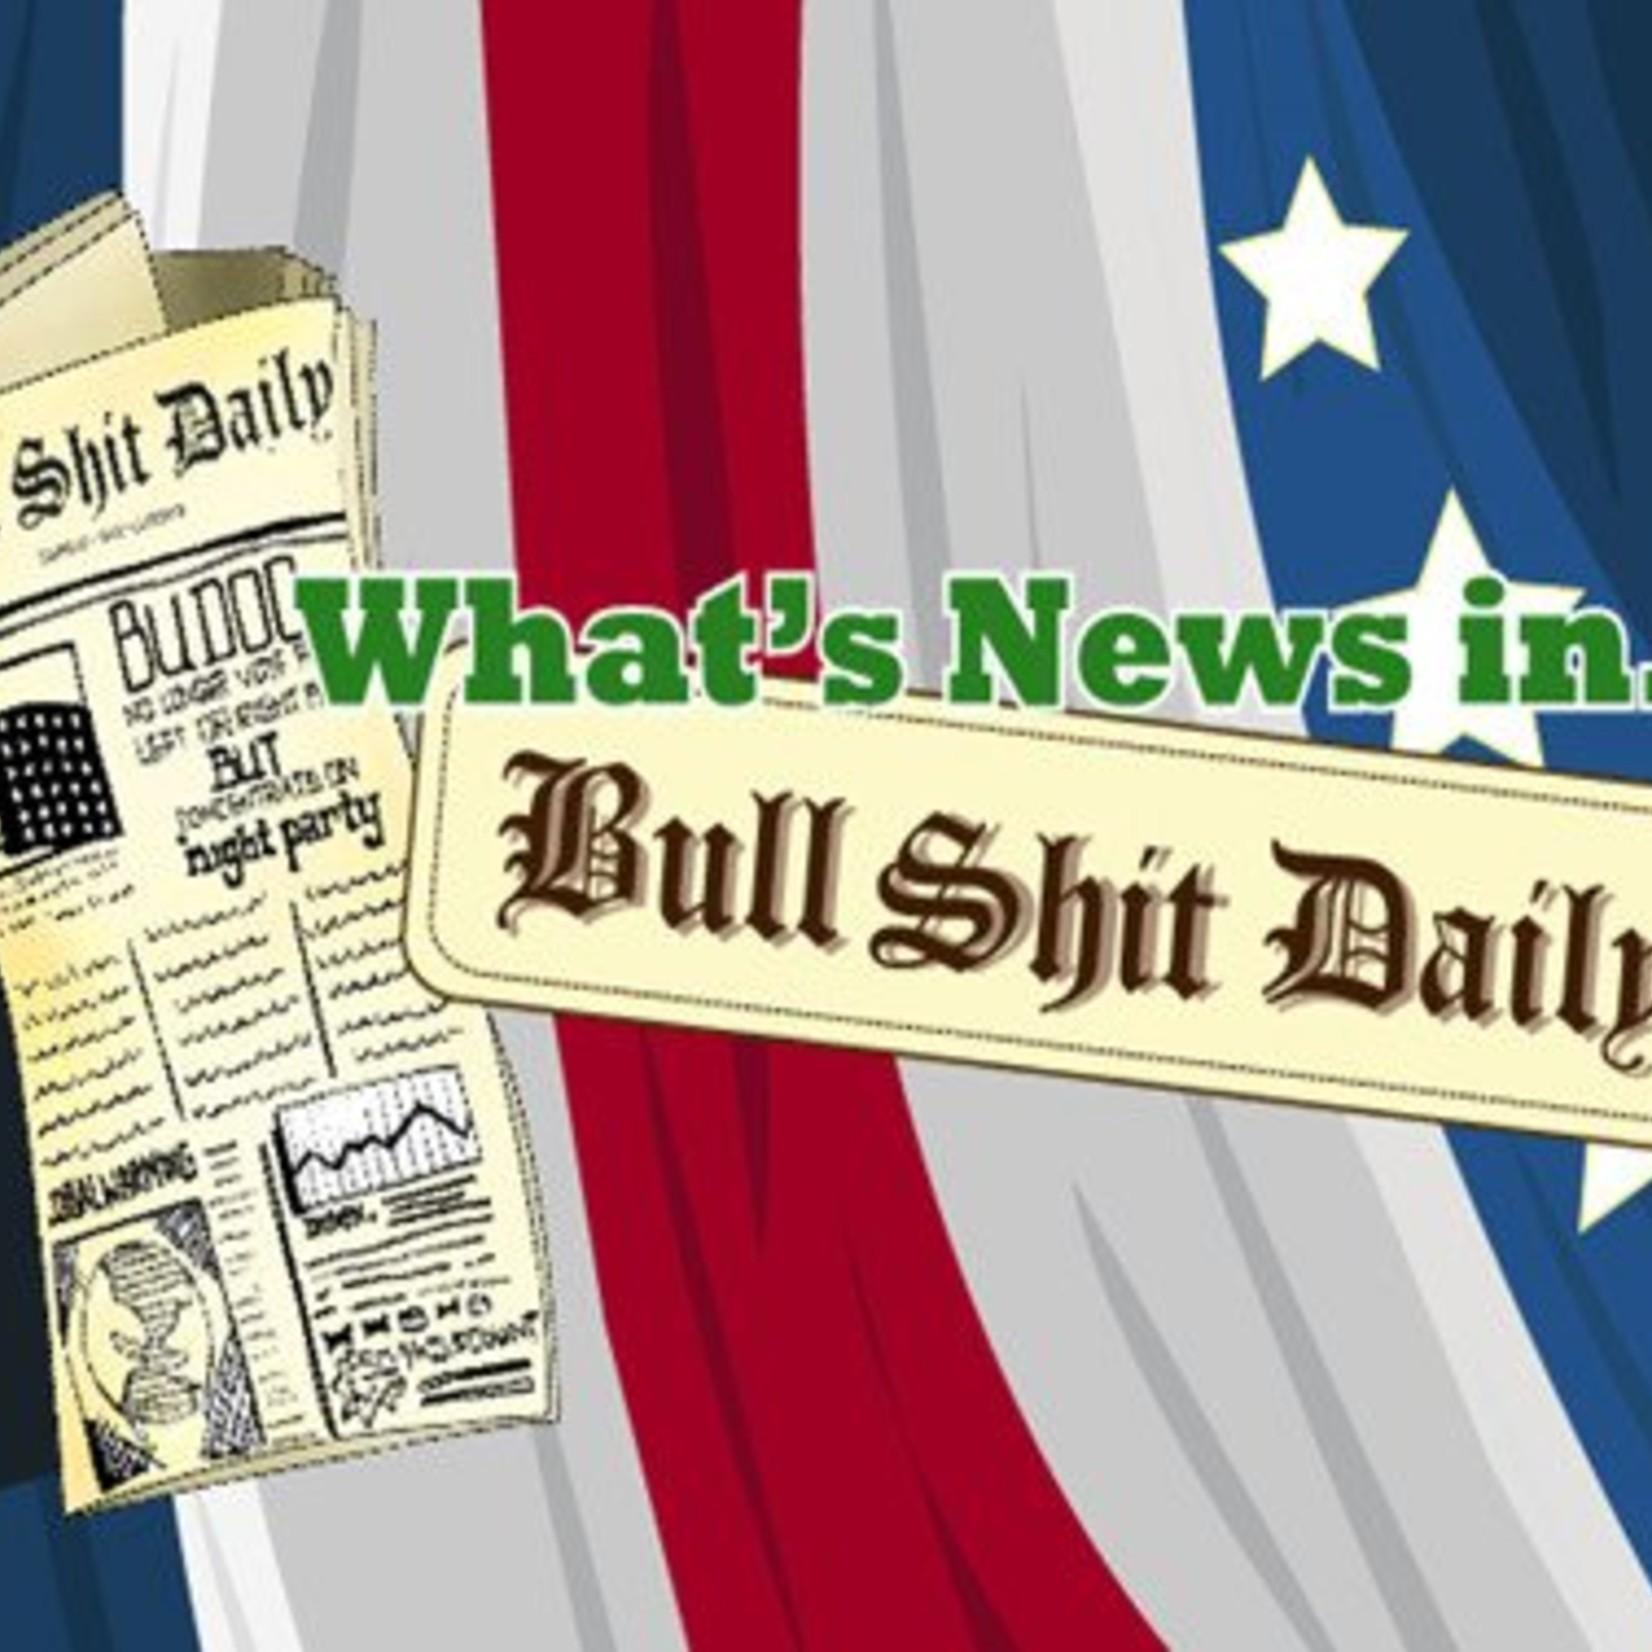 Spaarpot Dhink Bull Shit Daily